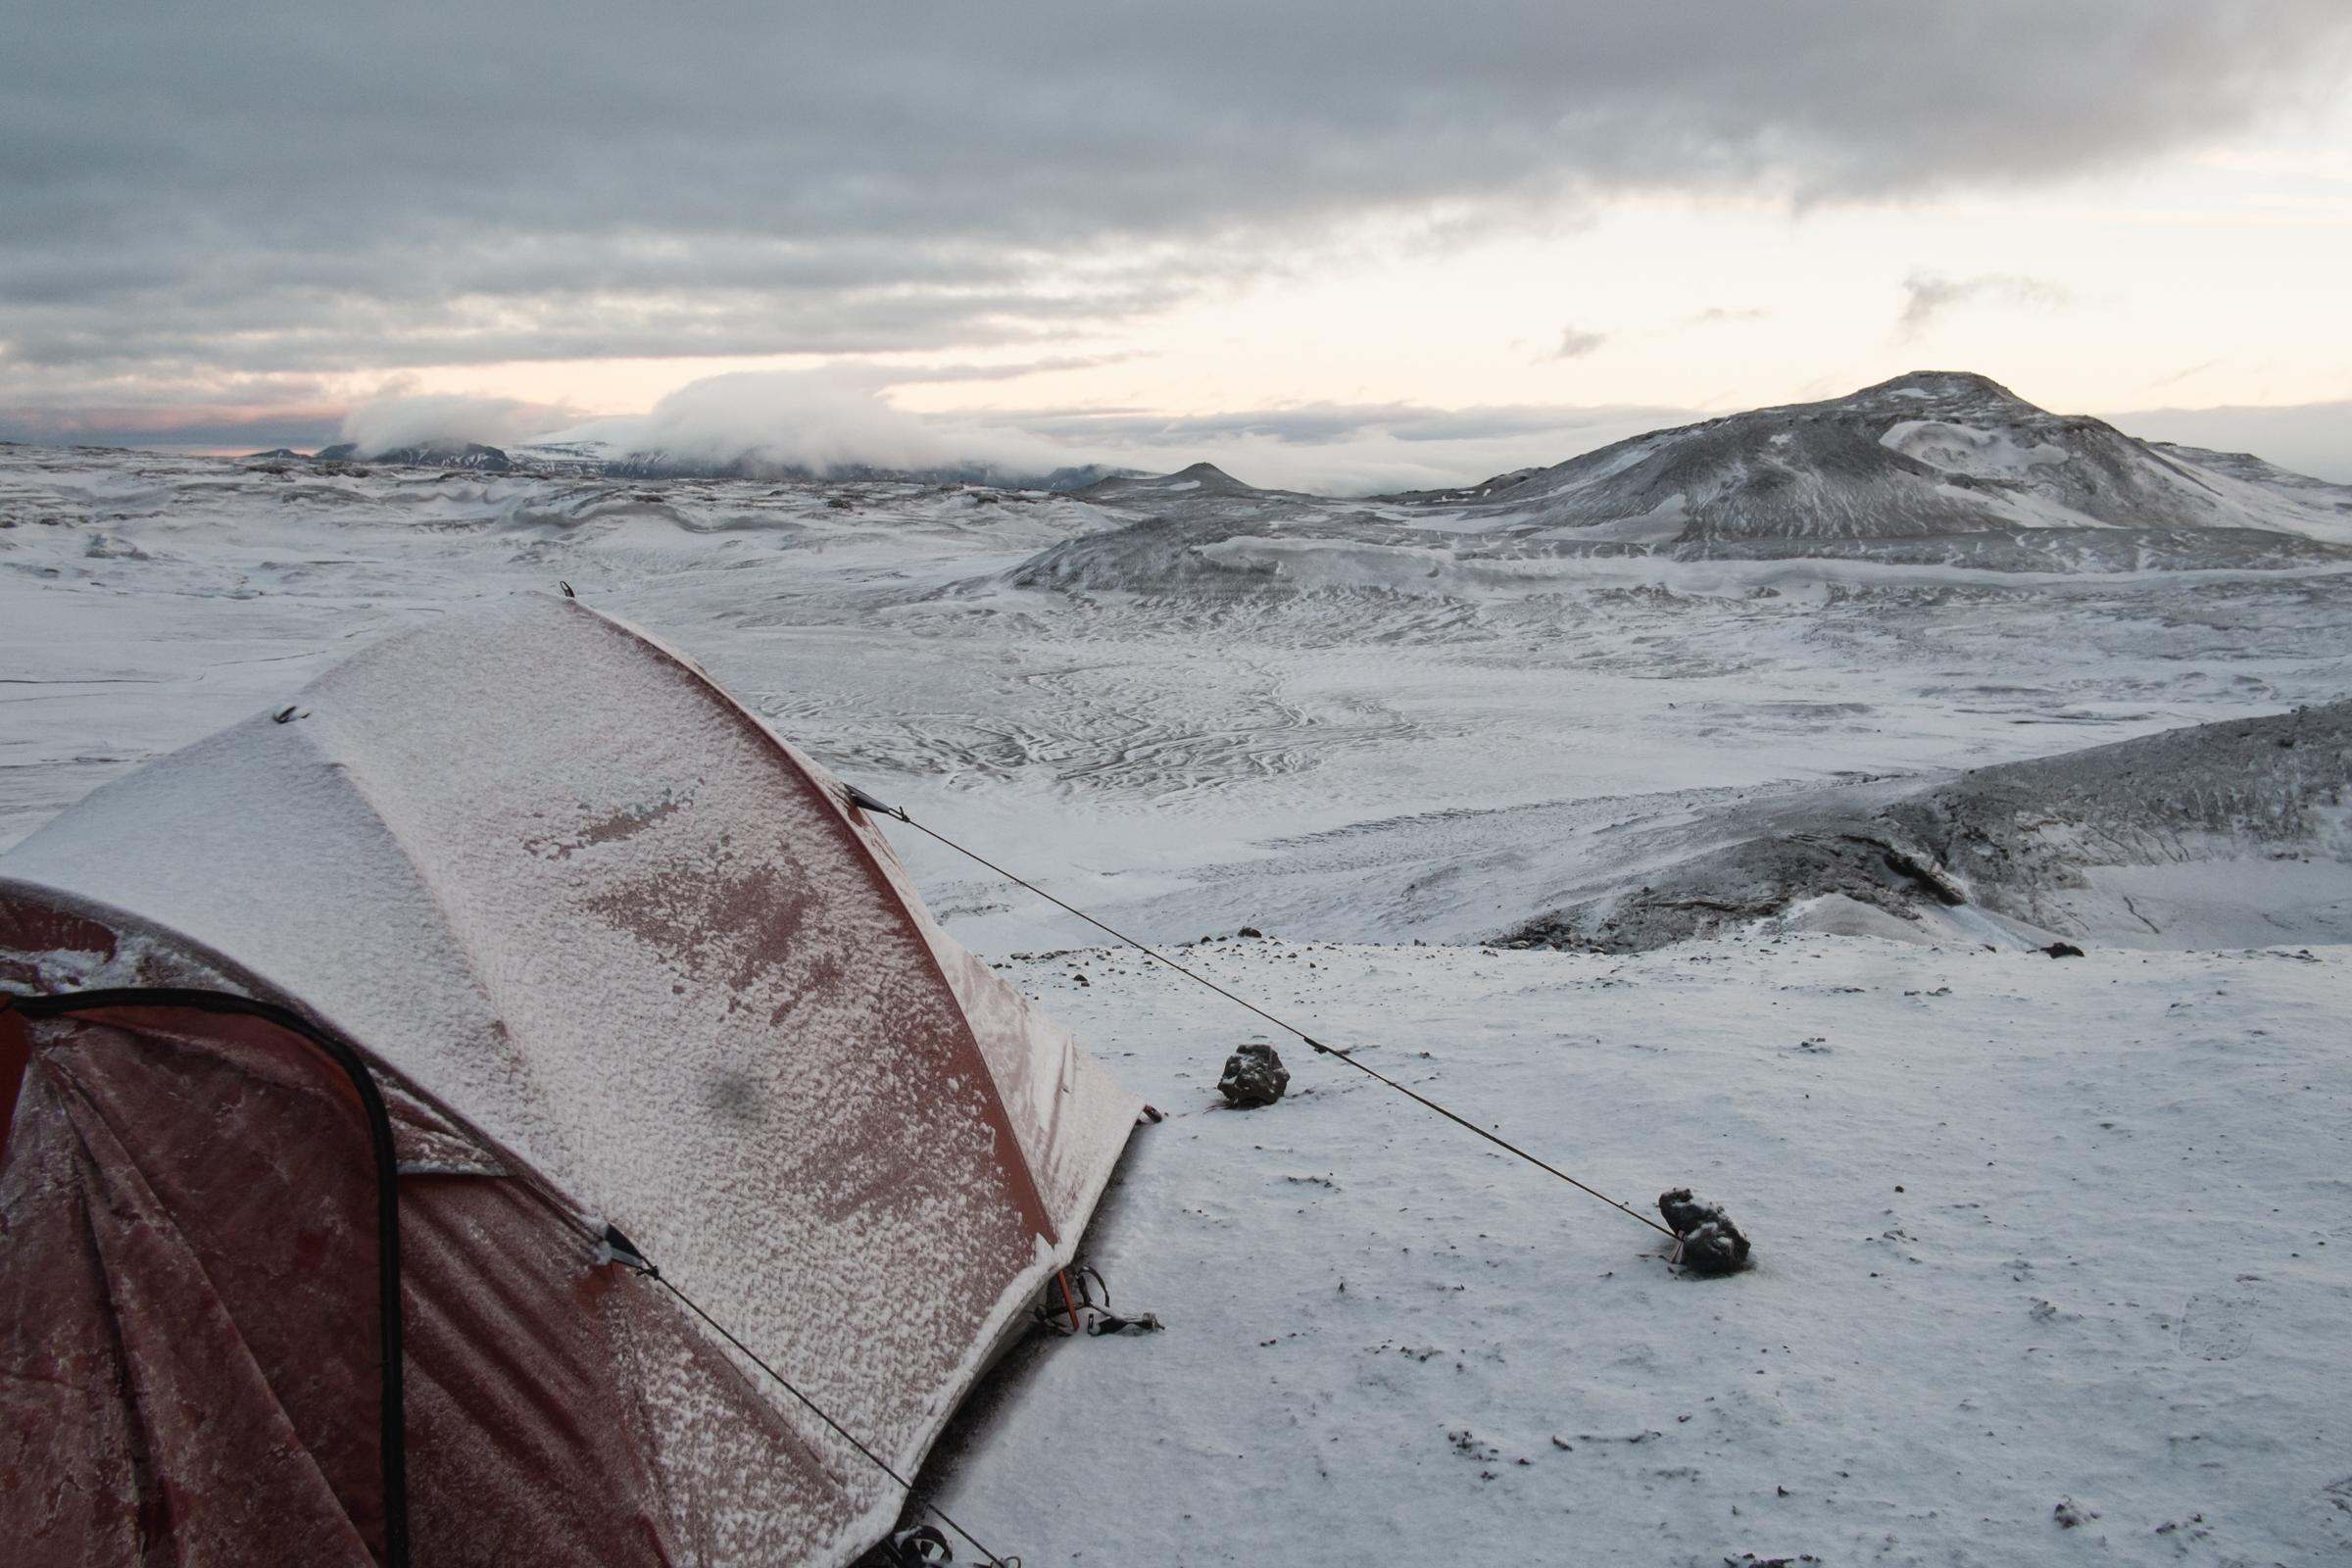 20131005-033-Iceland_Travel_Editorial.jpg